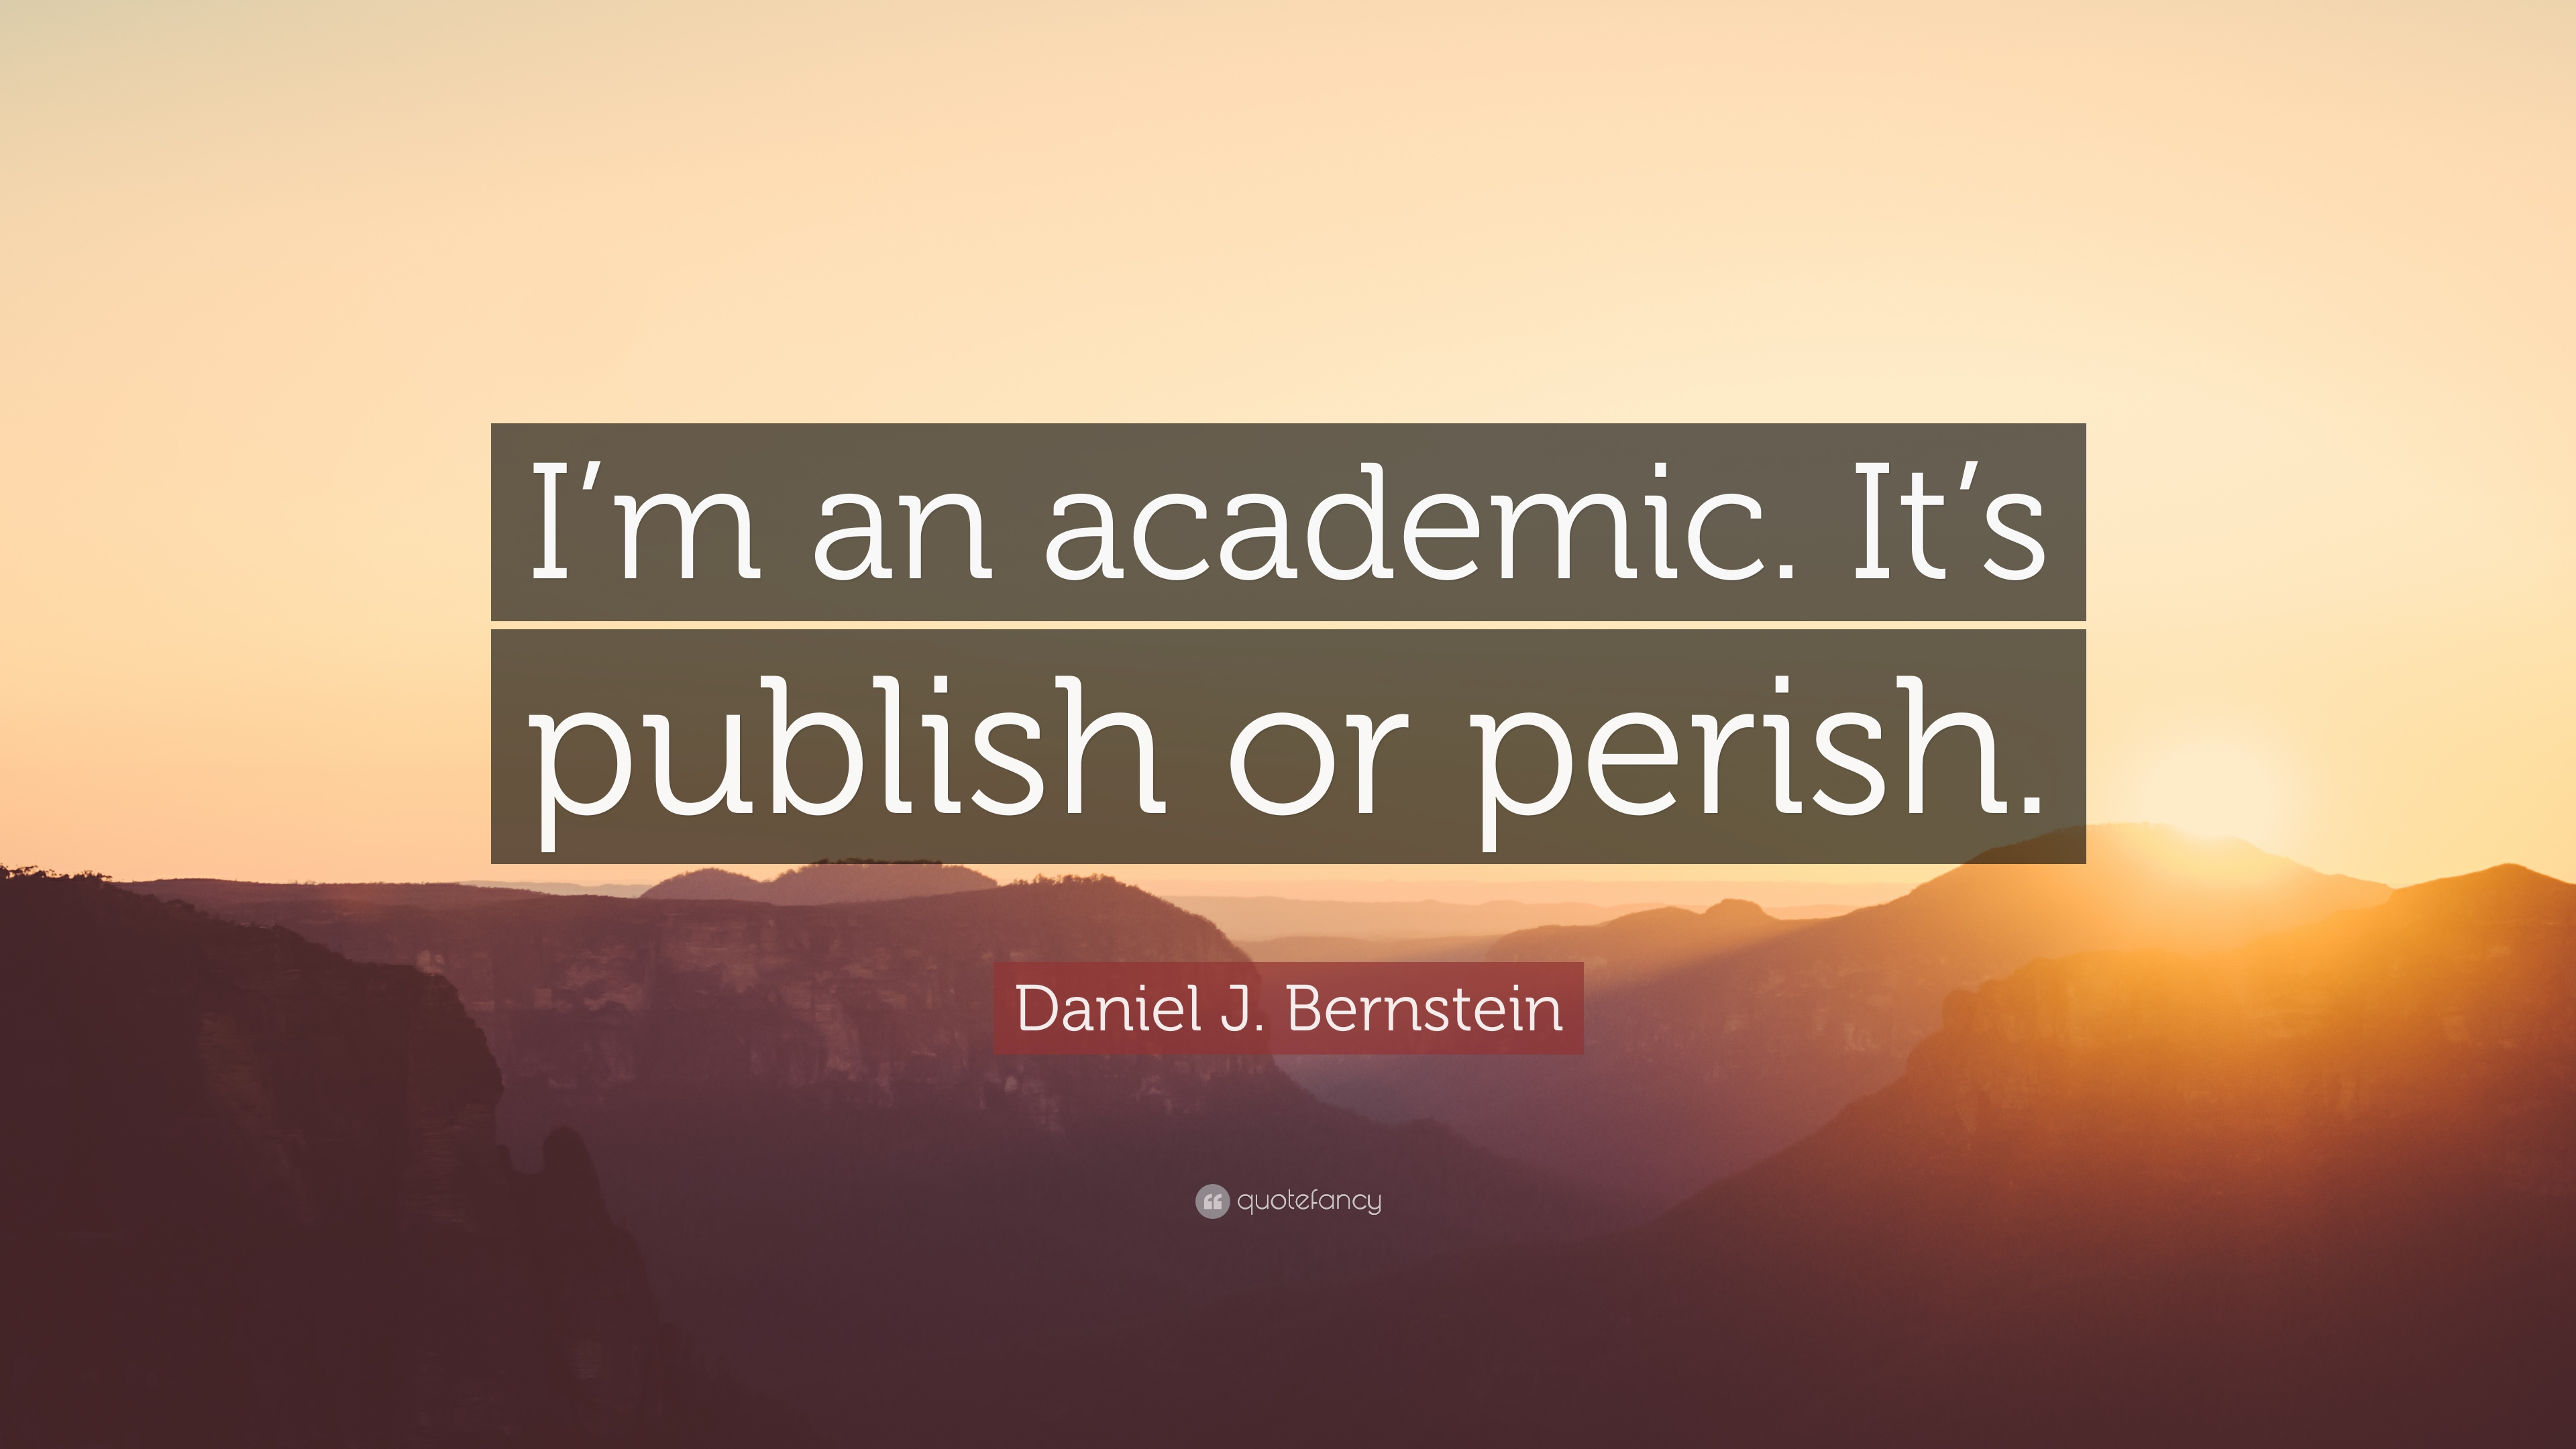 Academic Quotes Amusing Daniel Jbernstein Quotes 9 Wallpapers  Quotefancy